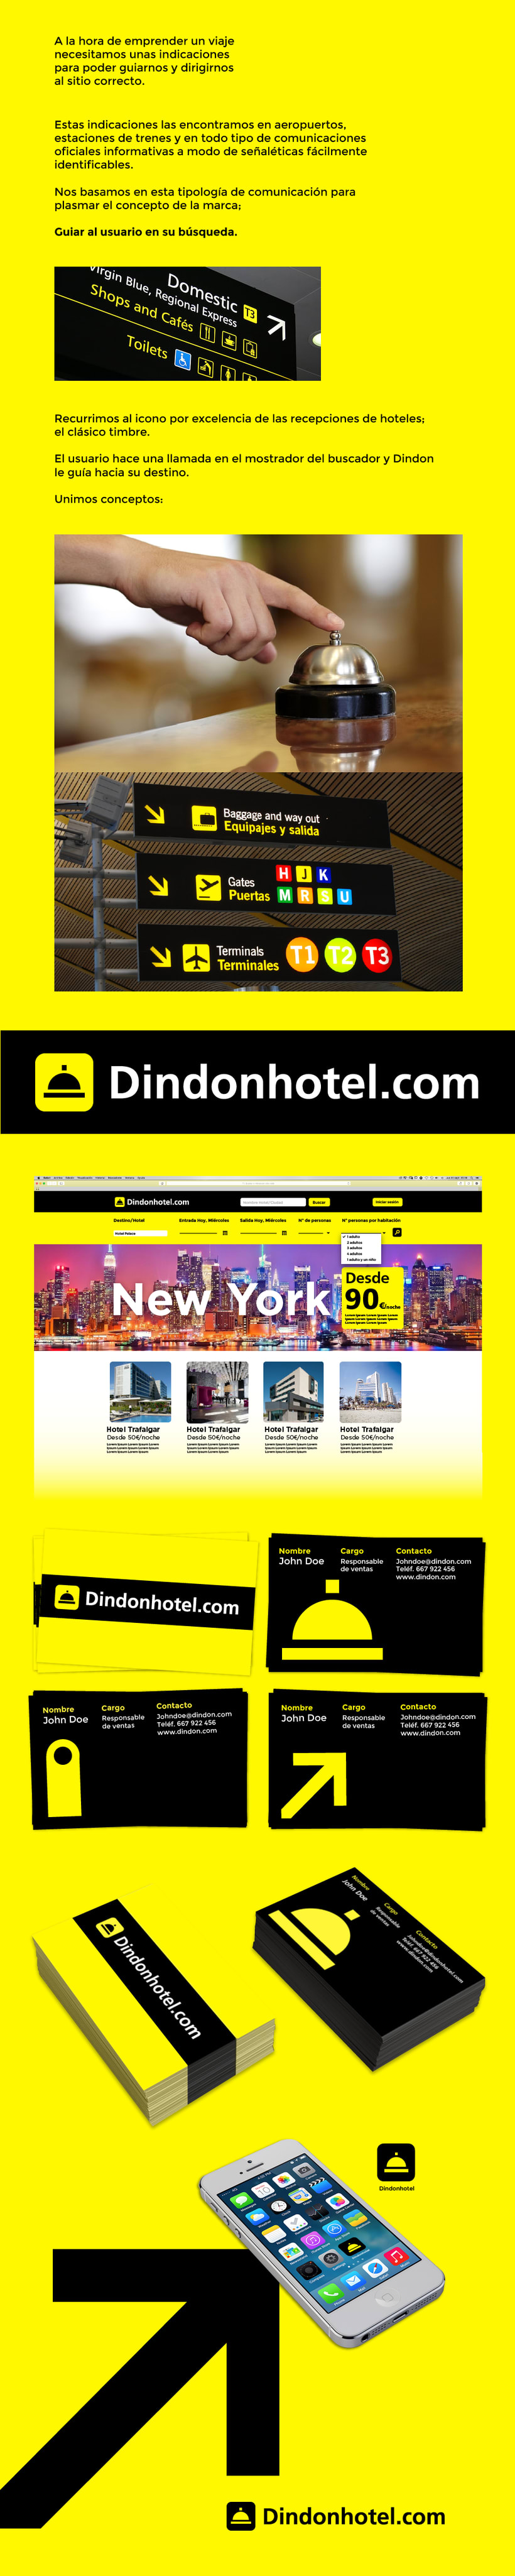 Dindonhotel · Branding/Web -1